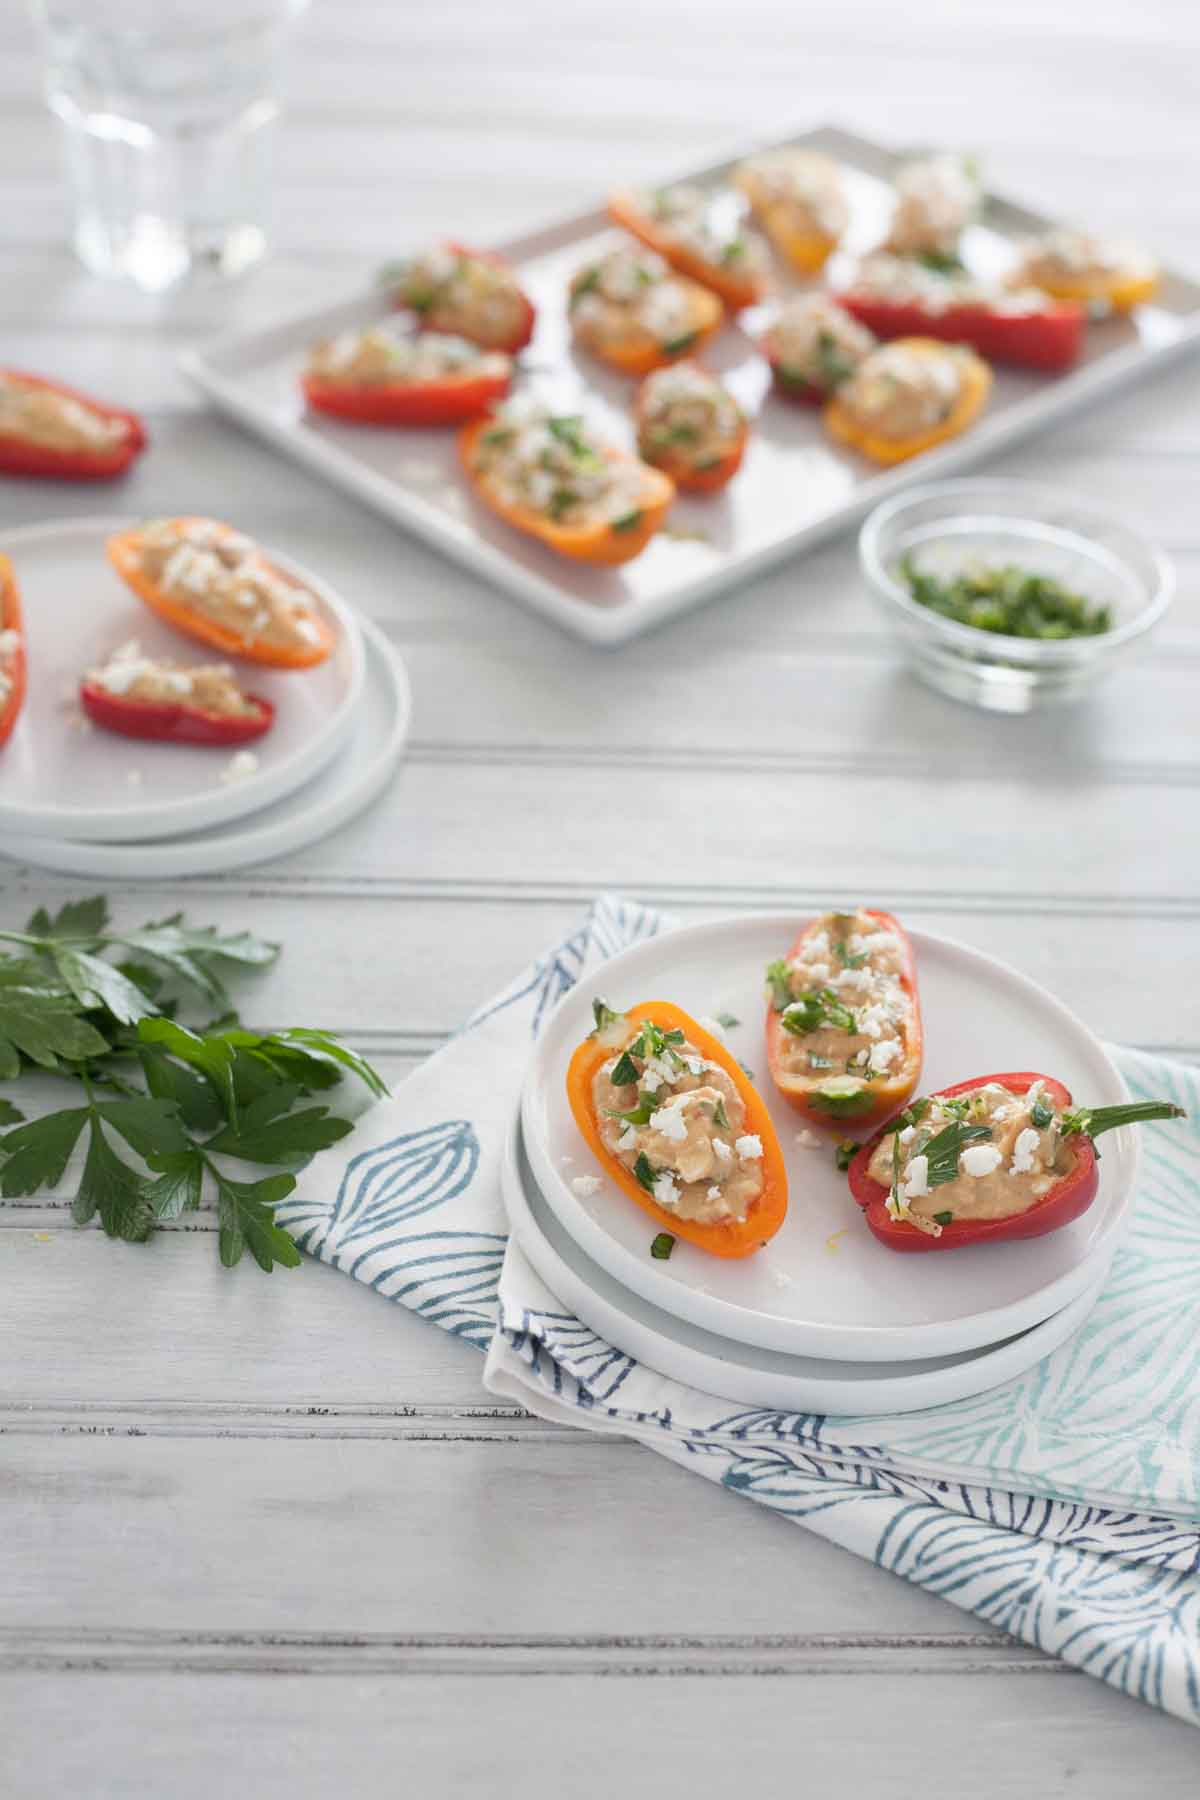 Feta and Hummus Stuffed Mini Peppers | BourbonandHoney.com